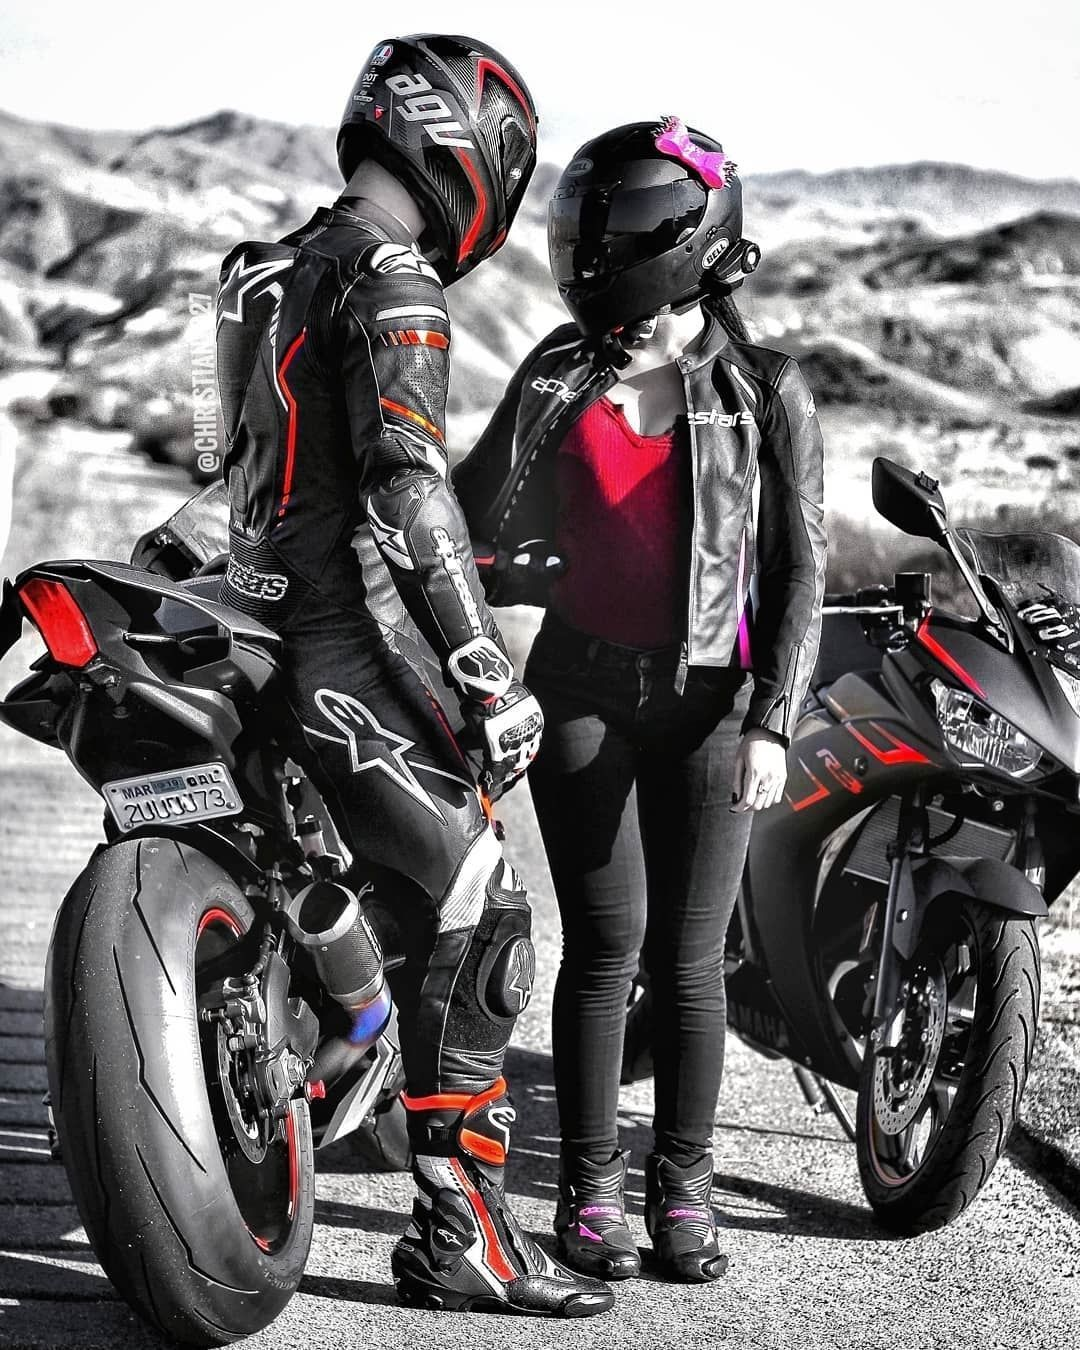 Bike Couple Wallpapers Wallpaper Cave